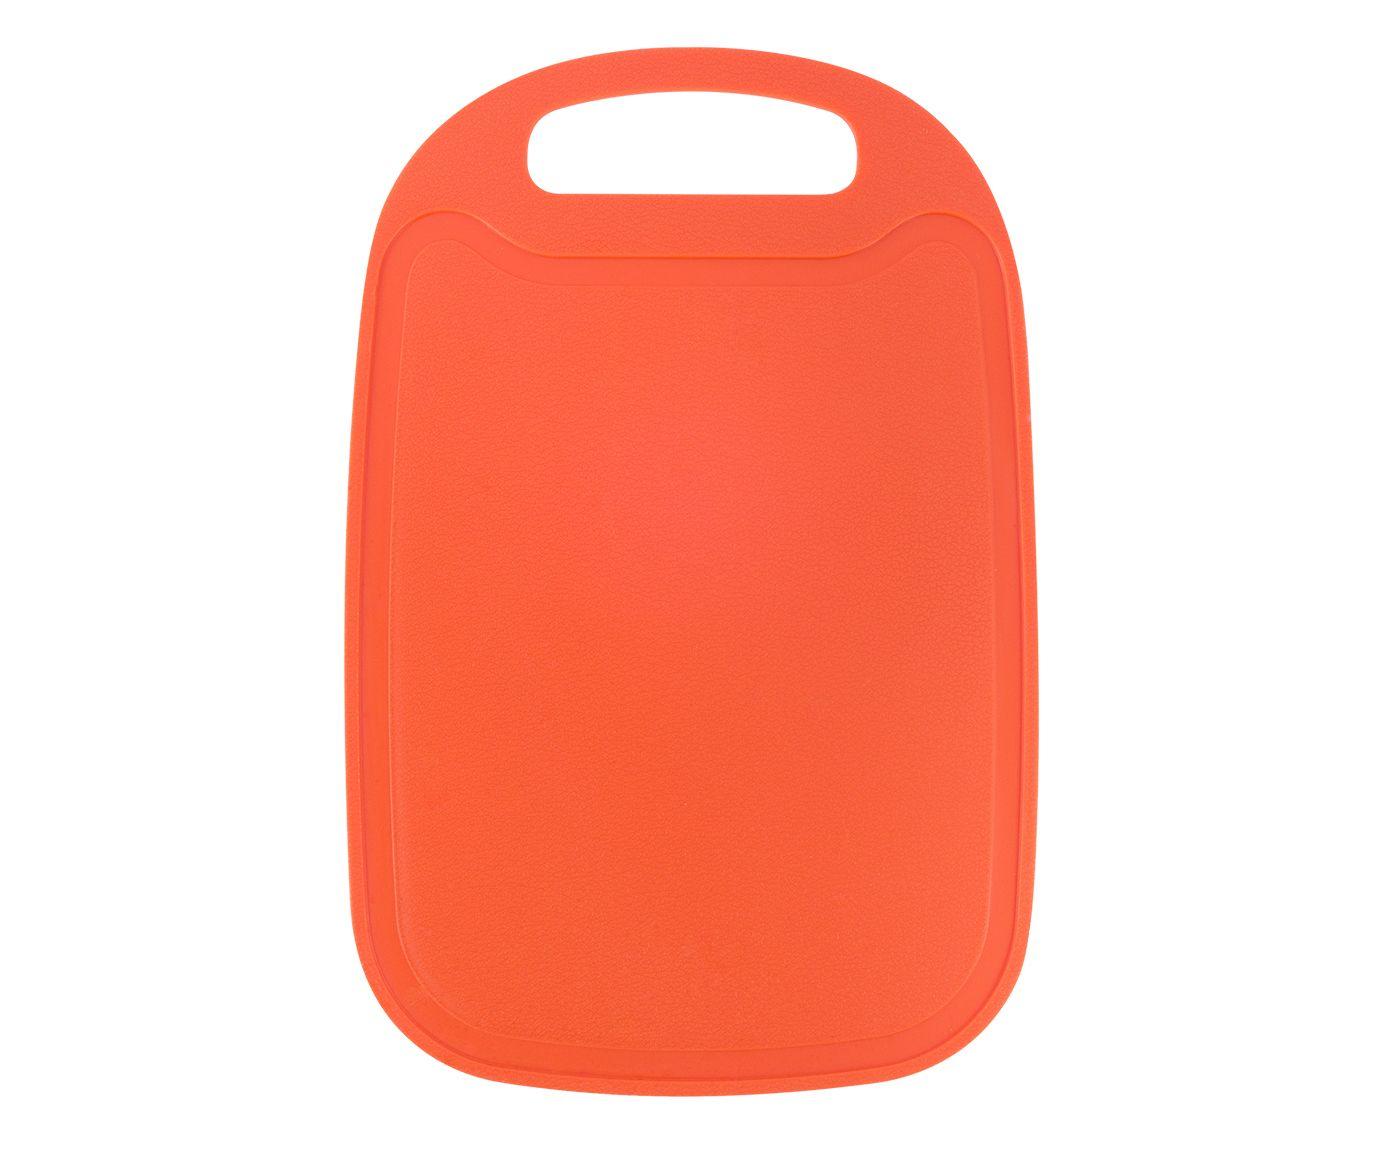 Tábua de Corte Wonderful Laranja - 32,5X0,4X22cm | Westwing.com.br